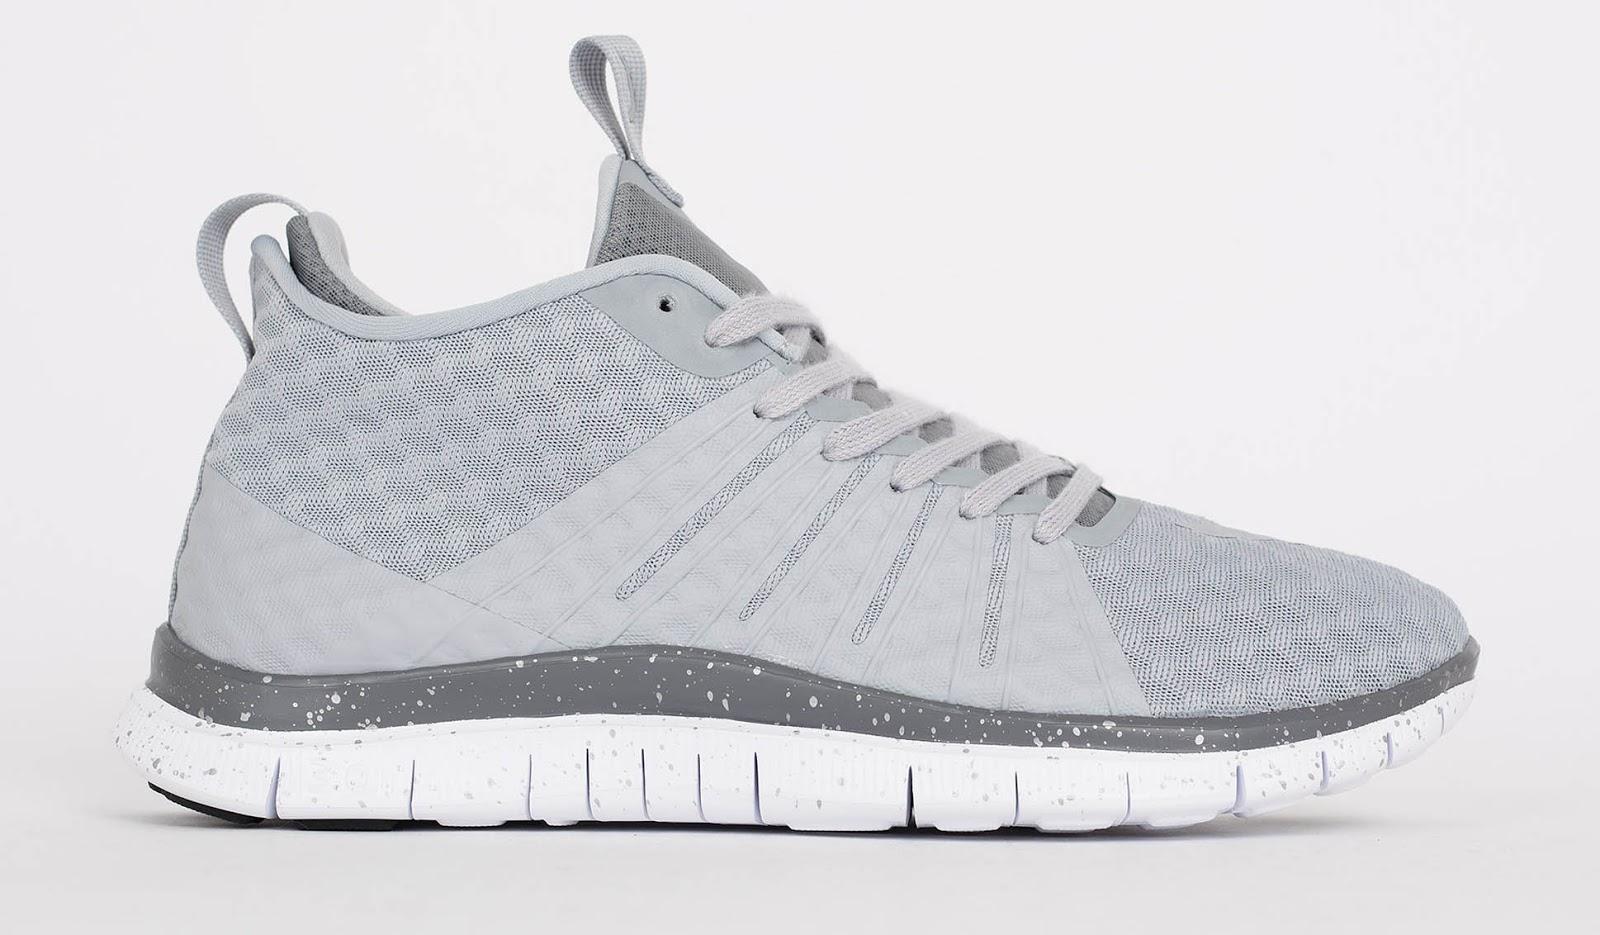 Nike Free Hypervenom II Shoes Revealed - Footy Headlines